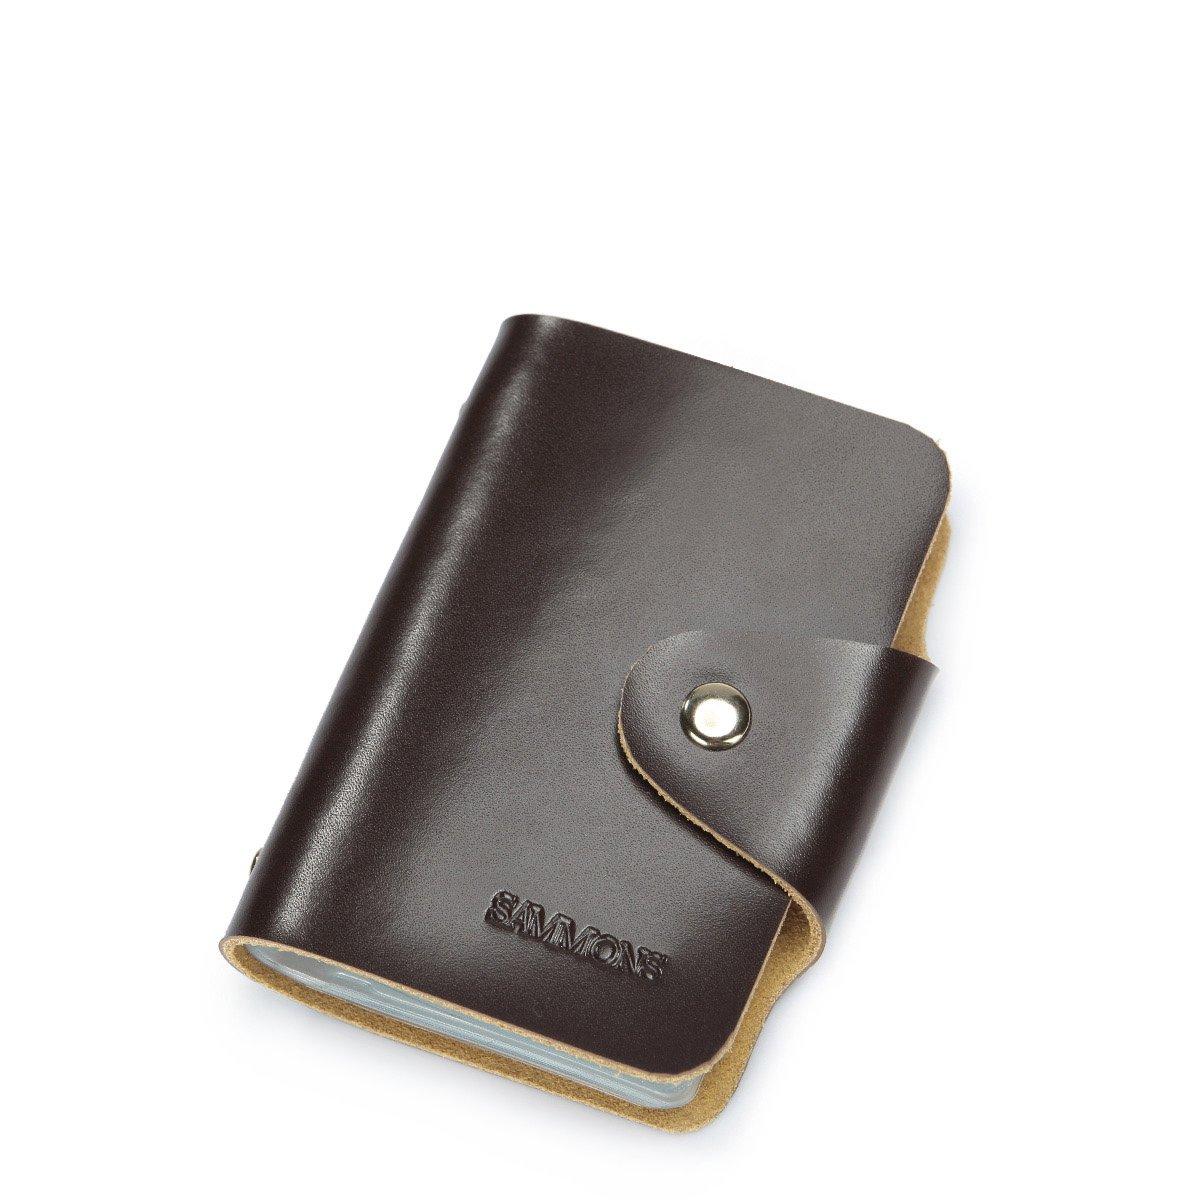 sammons 萨蒙斯 x战警系列牛皮男士证件包真皮商务便携大容量潮银行卡